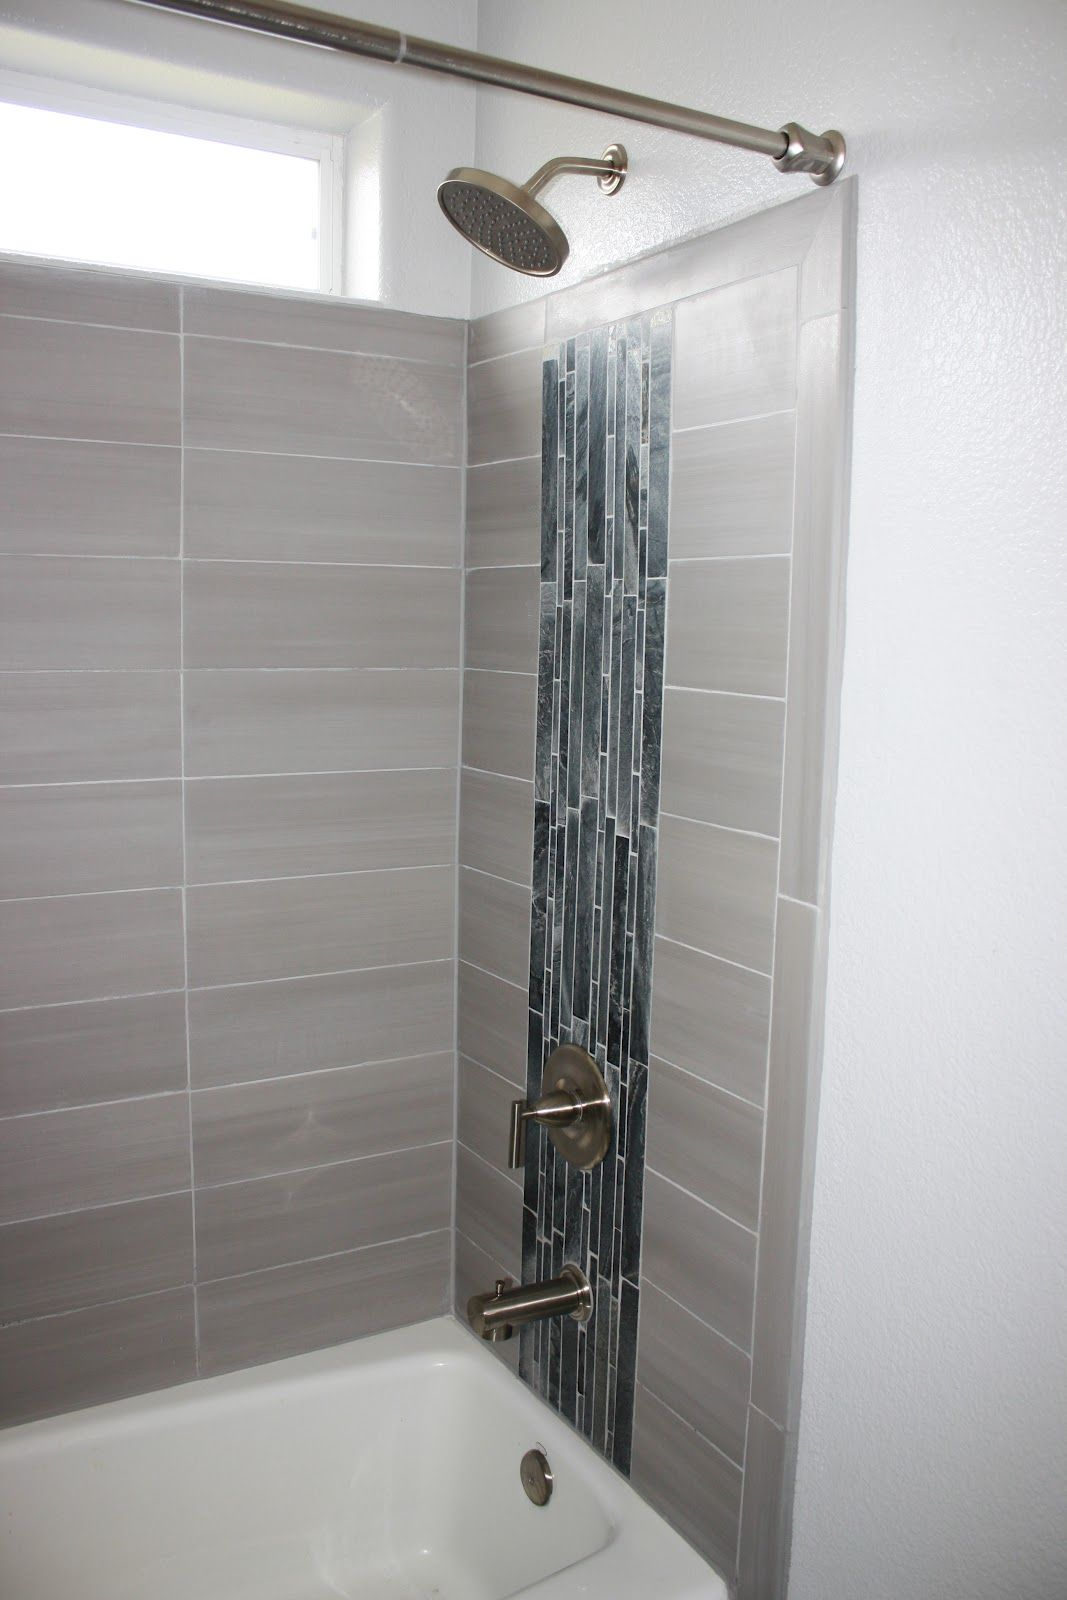 porcelain tile bathroom gray qdefTNzW | Home Sweet Home ...